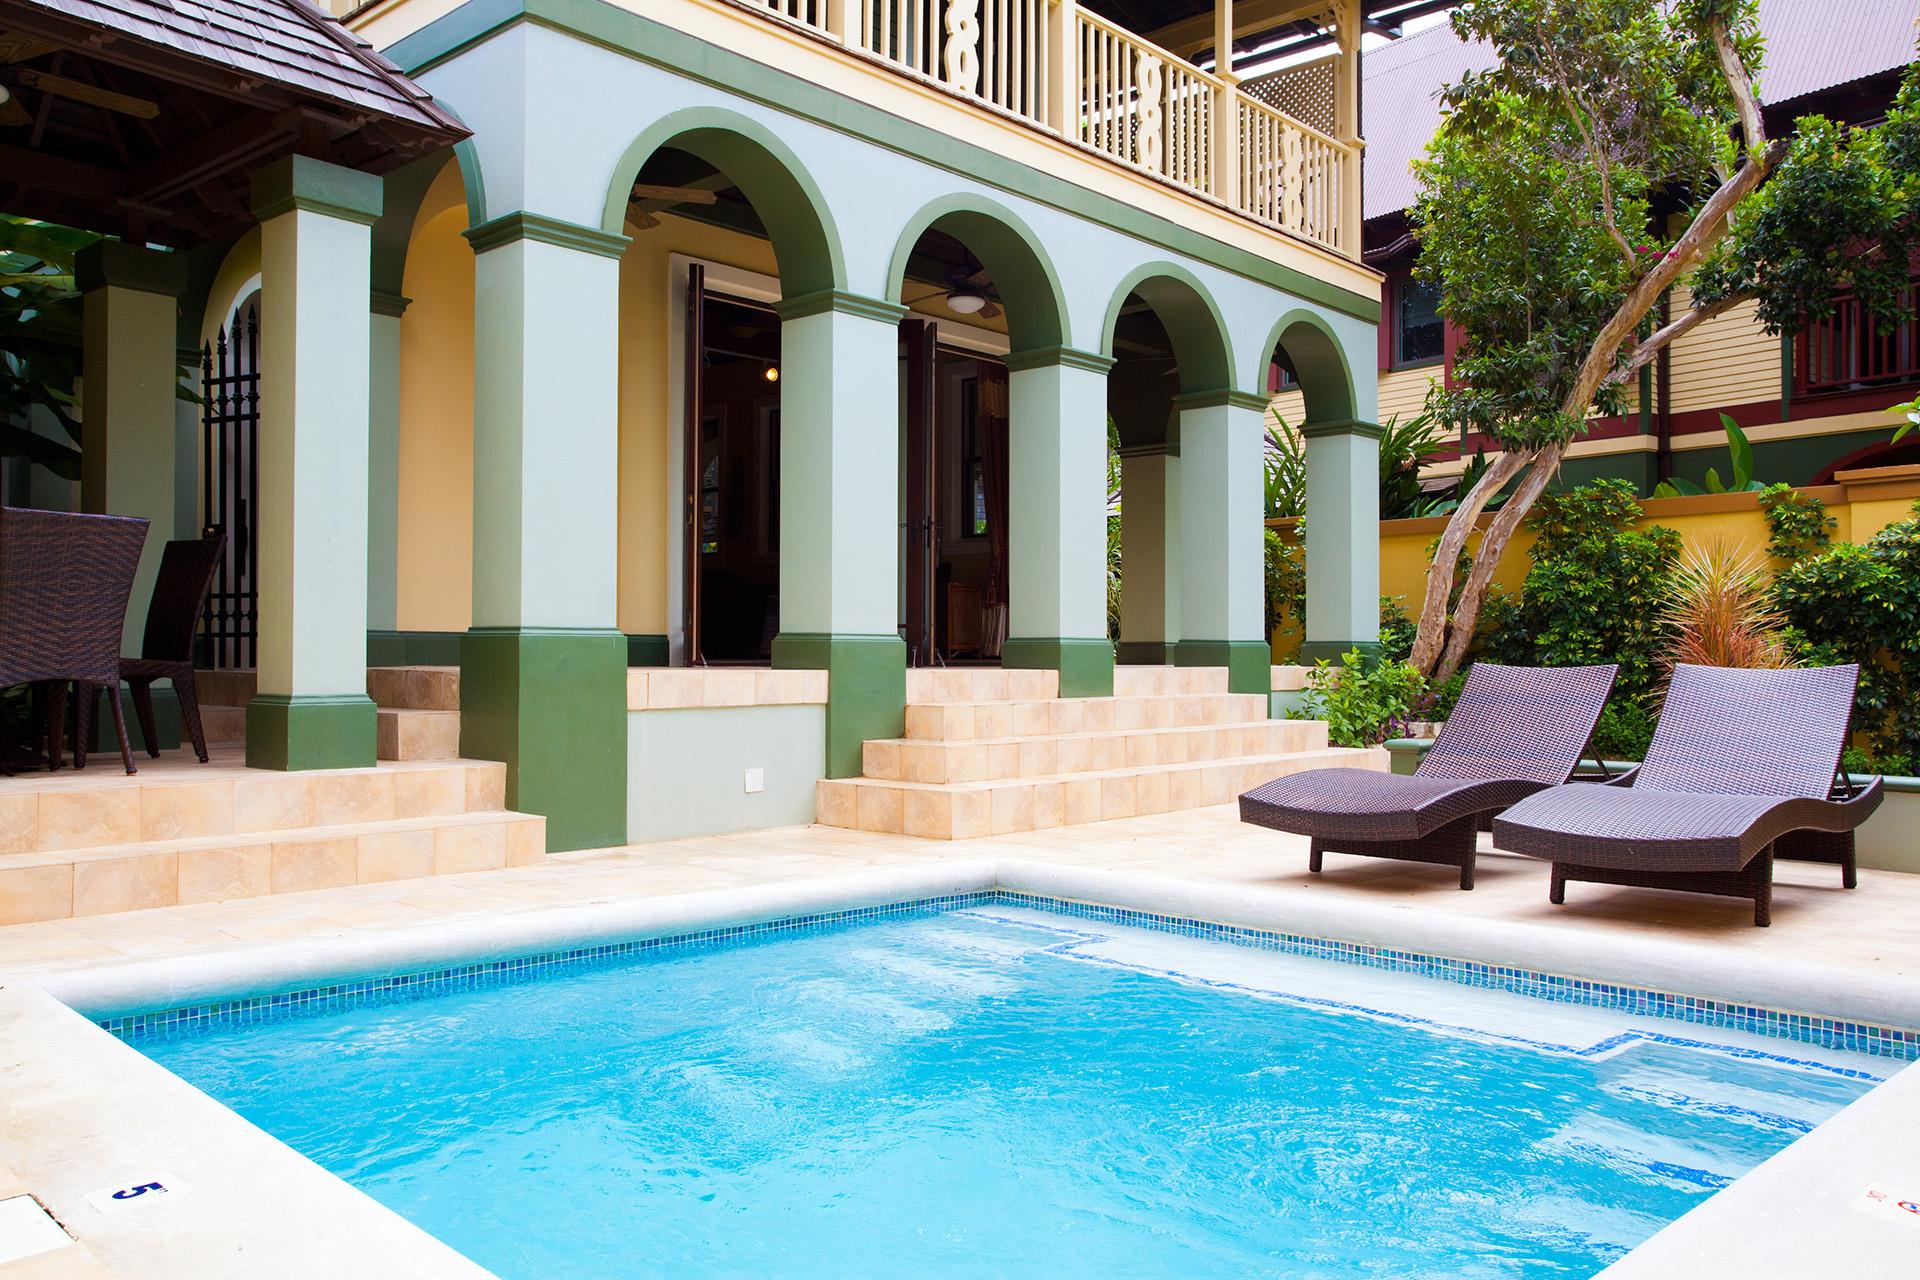 Calaloo pool